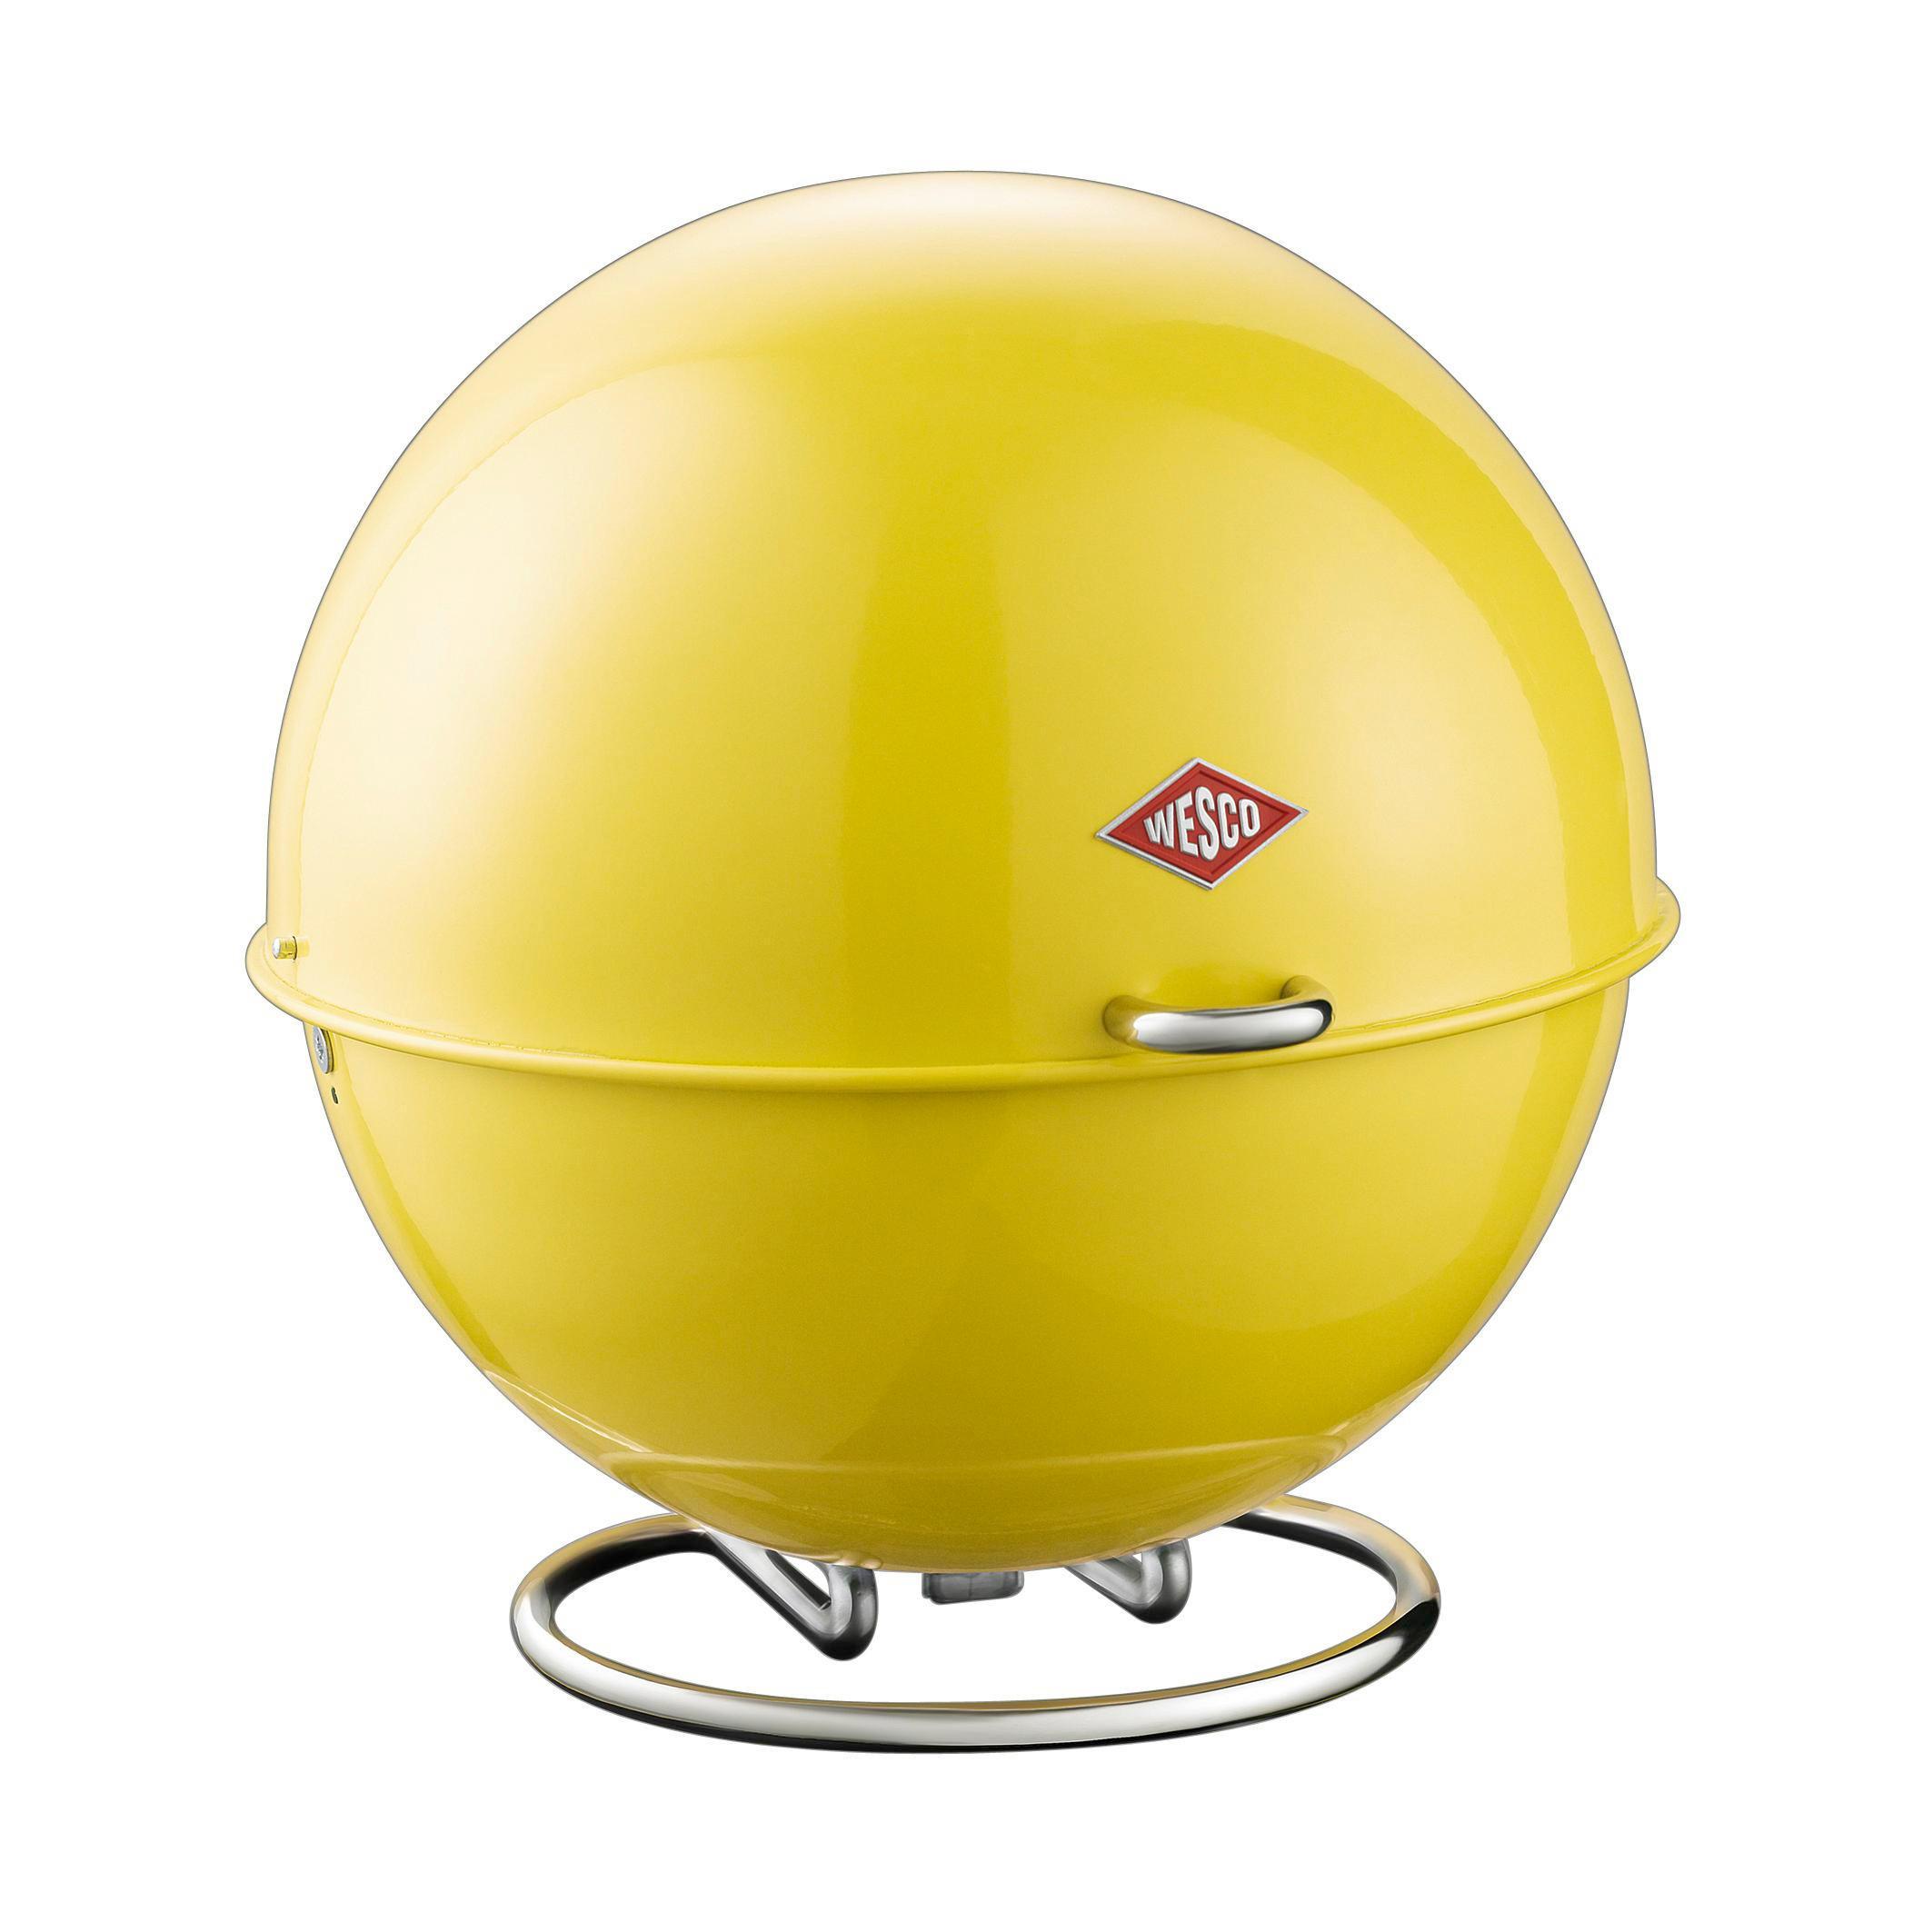 AUFBEWAHRUNGSBOX - Gelb, Basics, Metall (26/26/26cm) - WESCO